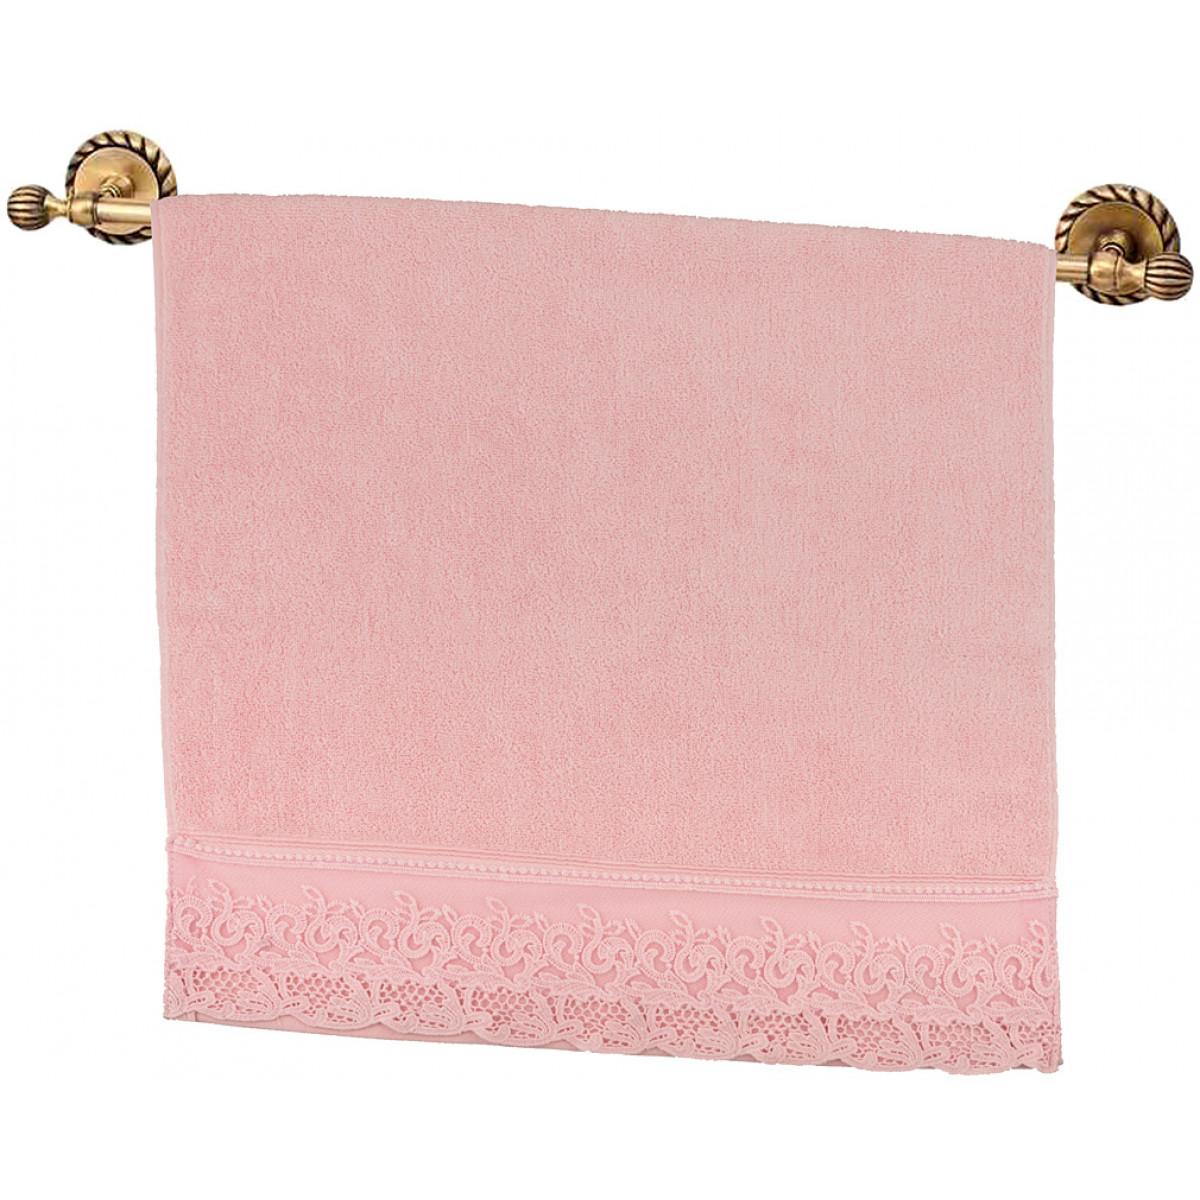 Полотенца Santalino Полотенце Dave  (50х90 см) полотенца банные la pastel полотенце кружево 50х90 см